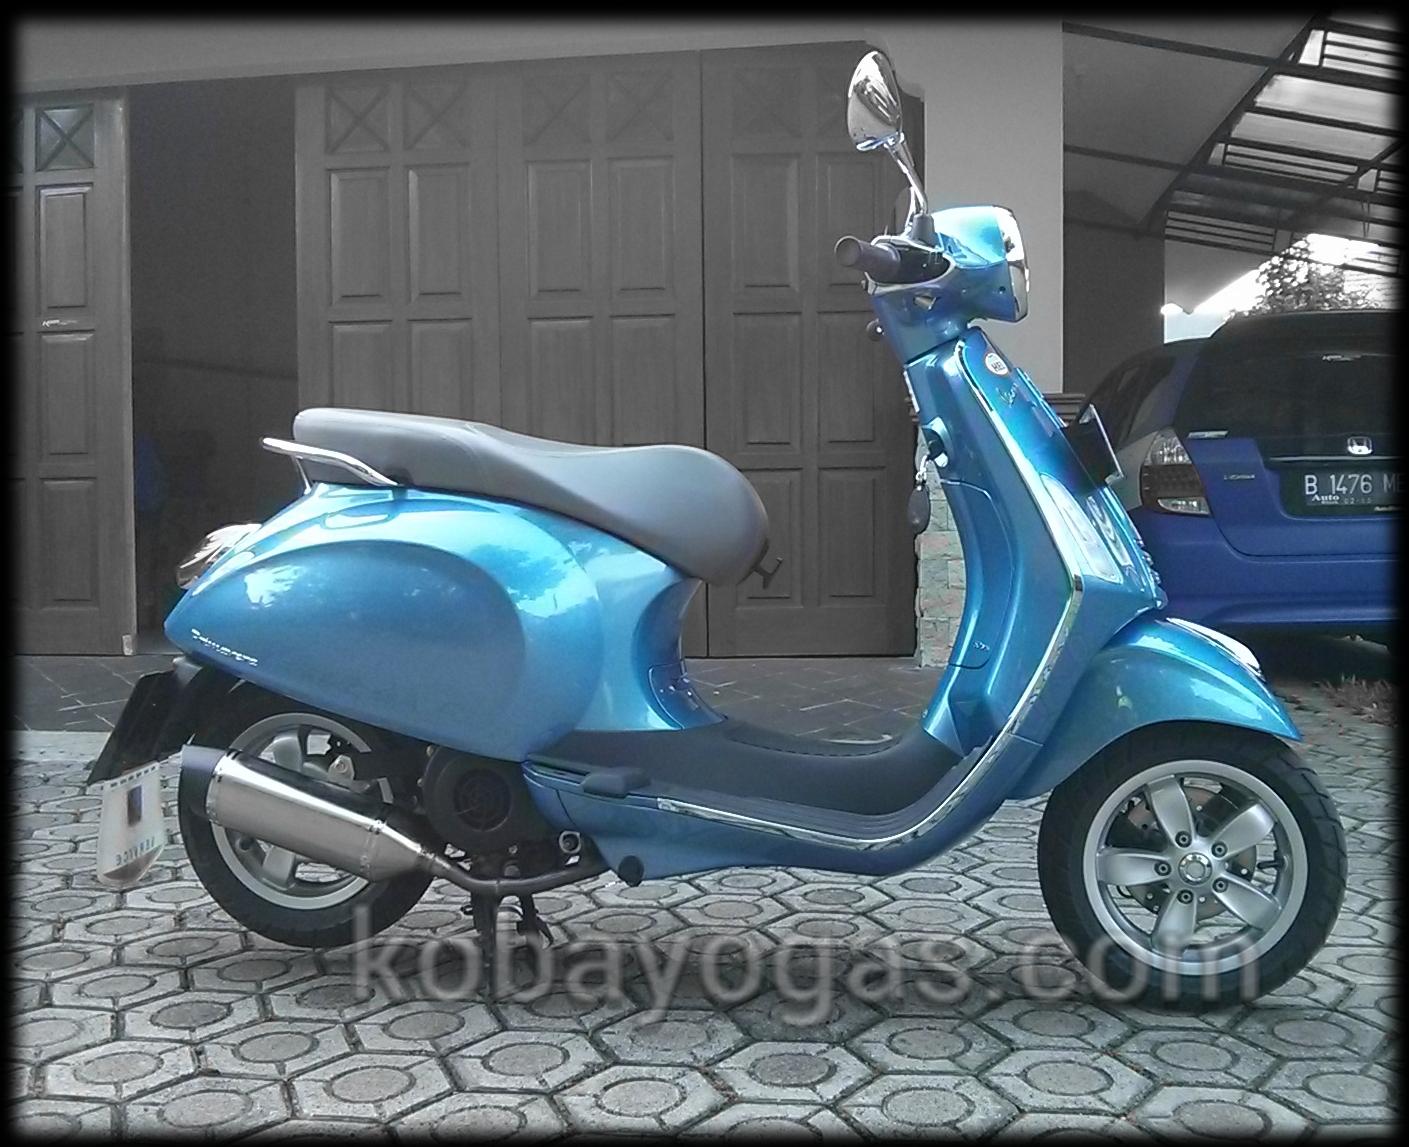 Modifikasi Sharing Exhaust Custom Vespa Primavera Made By Chuenk Malossi Piggyback Untuk Sprint